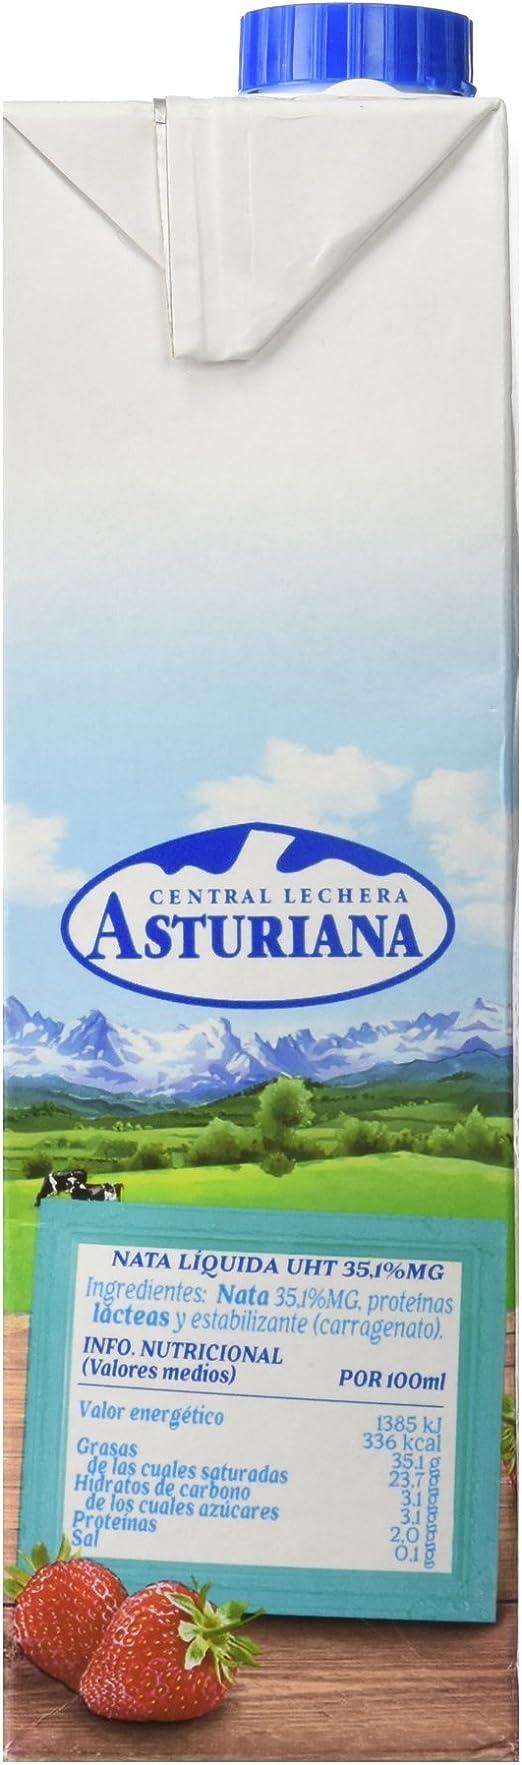 Central Lechera Asturiana Nata Liquida Uht, 1L: Amazon.es ...